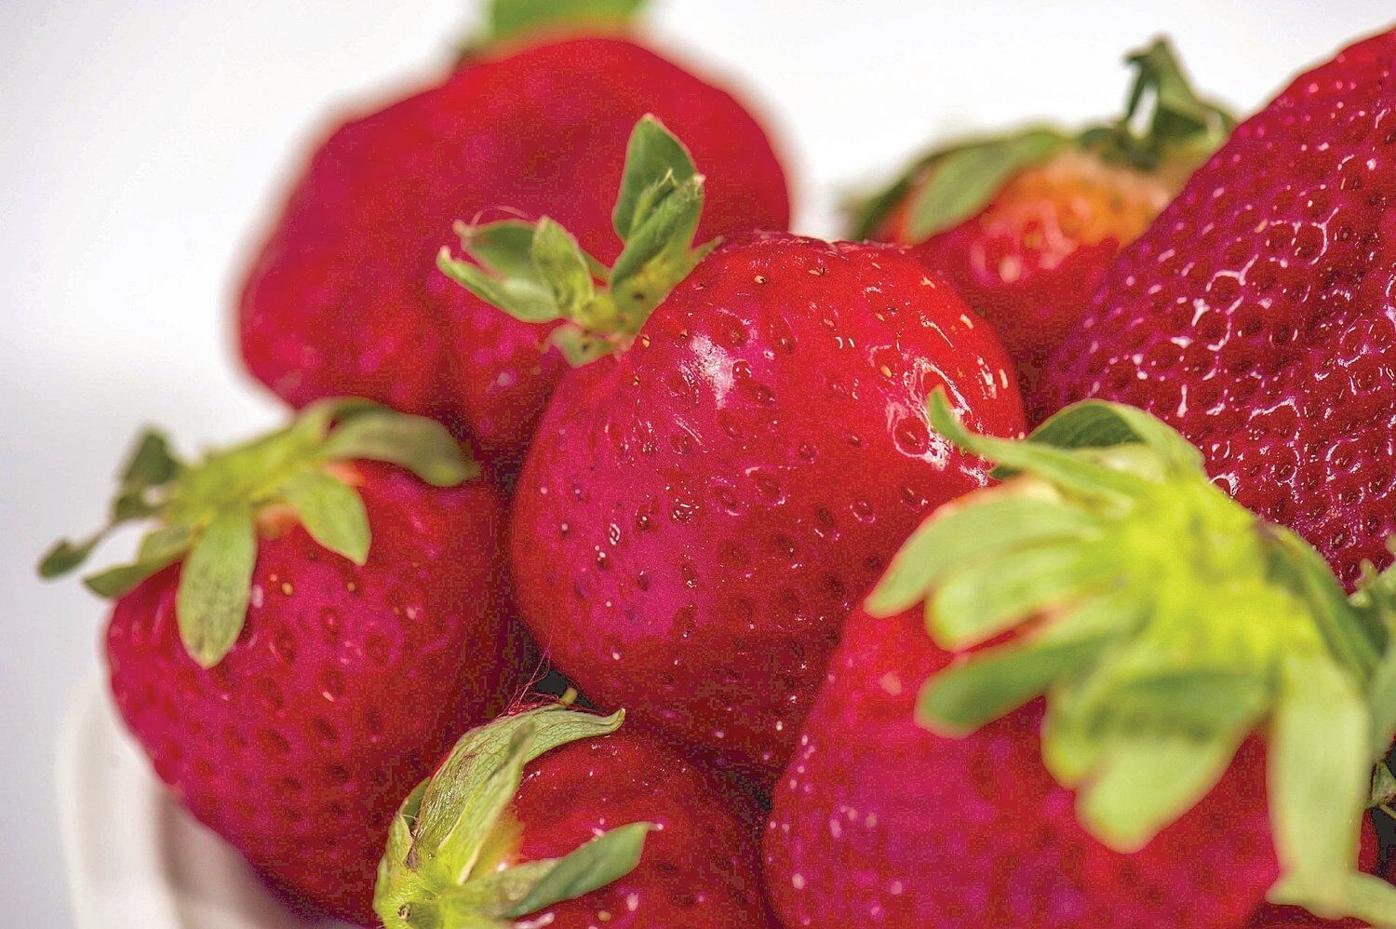 Fresh strawberries for breakfast? Yes!